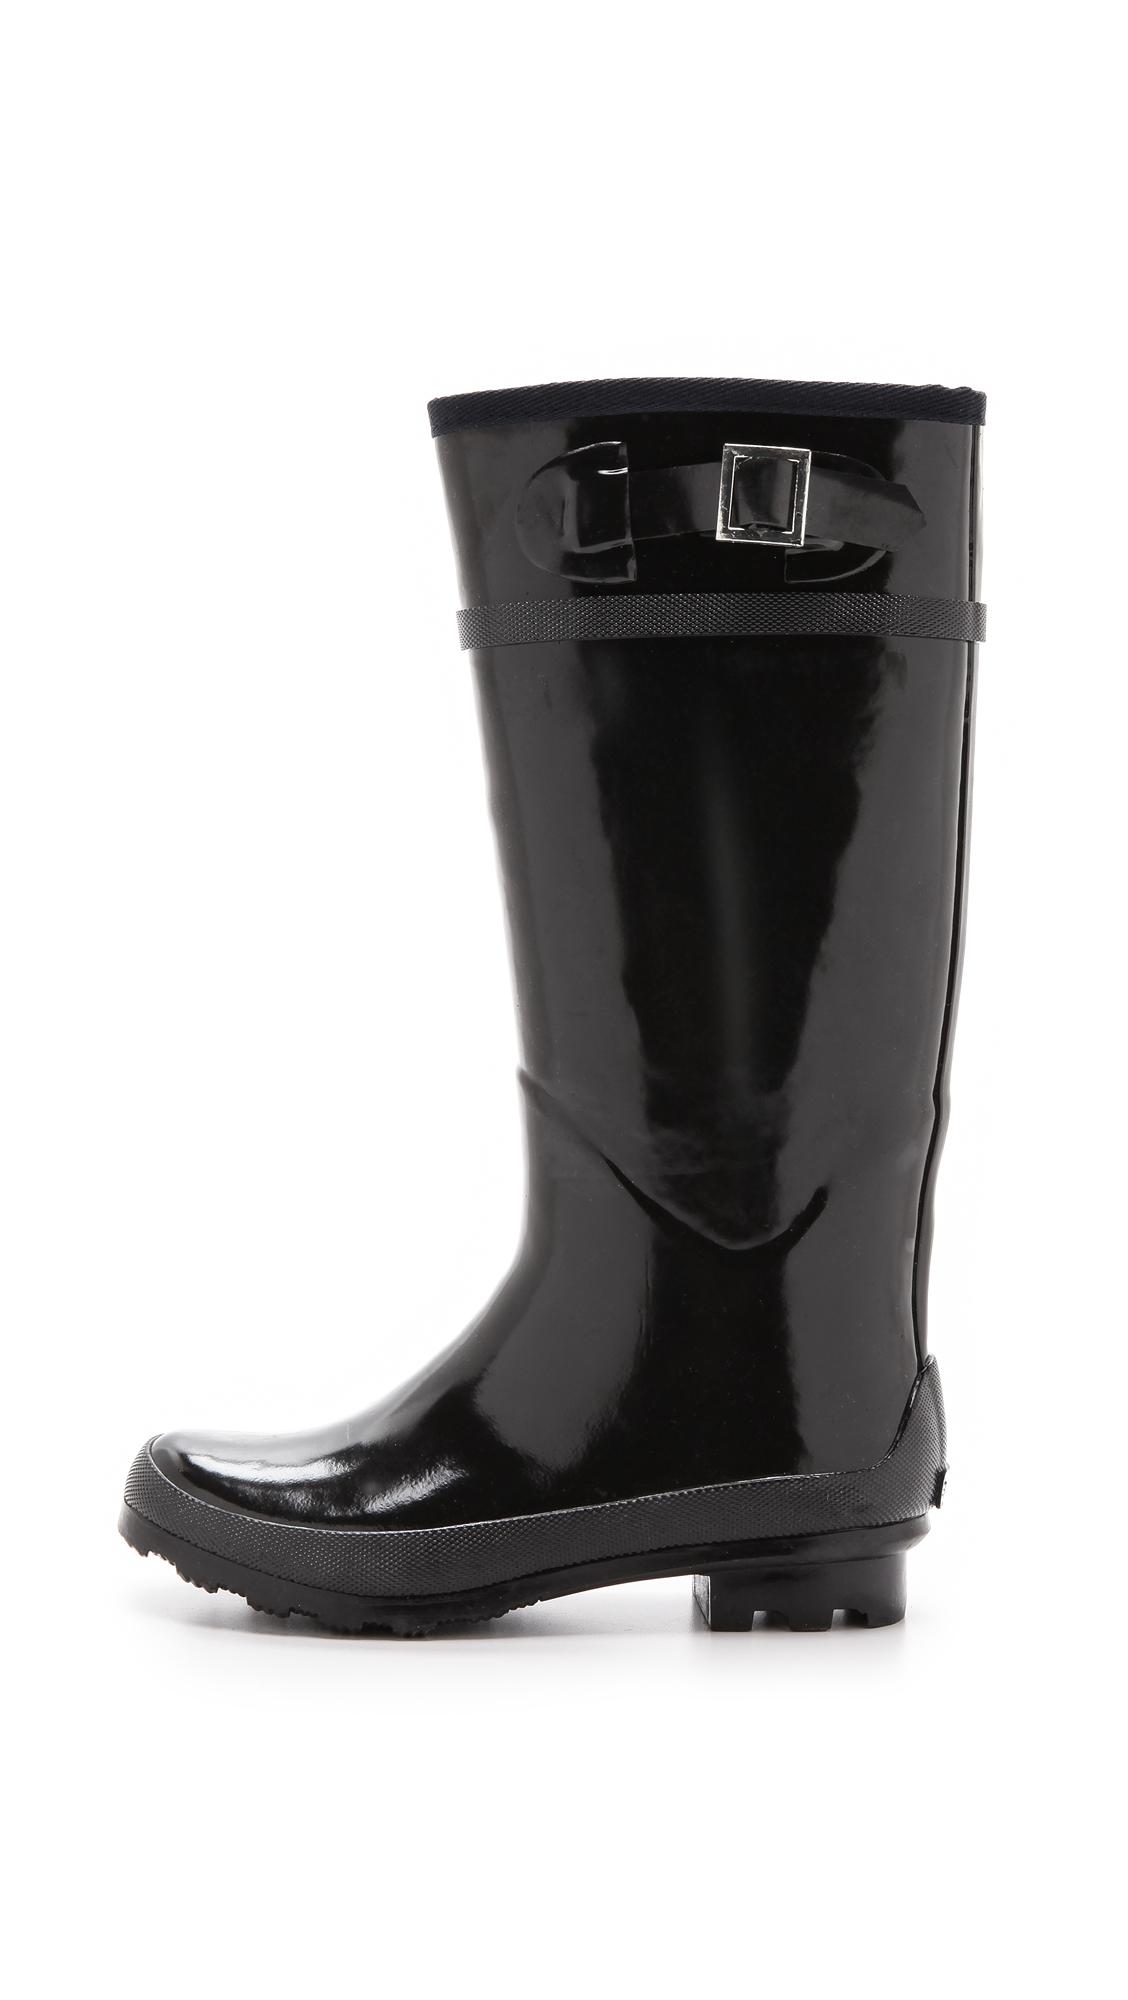 Superga Tall Rain Boots - Black